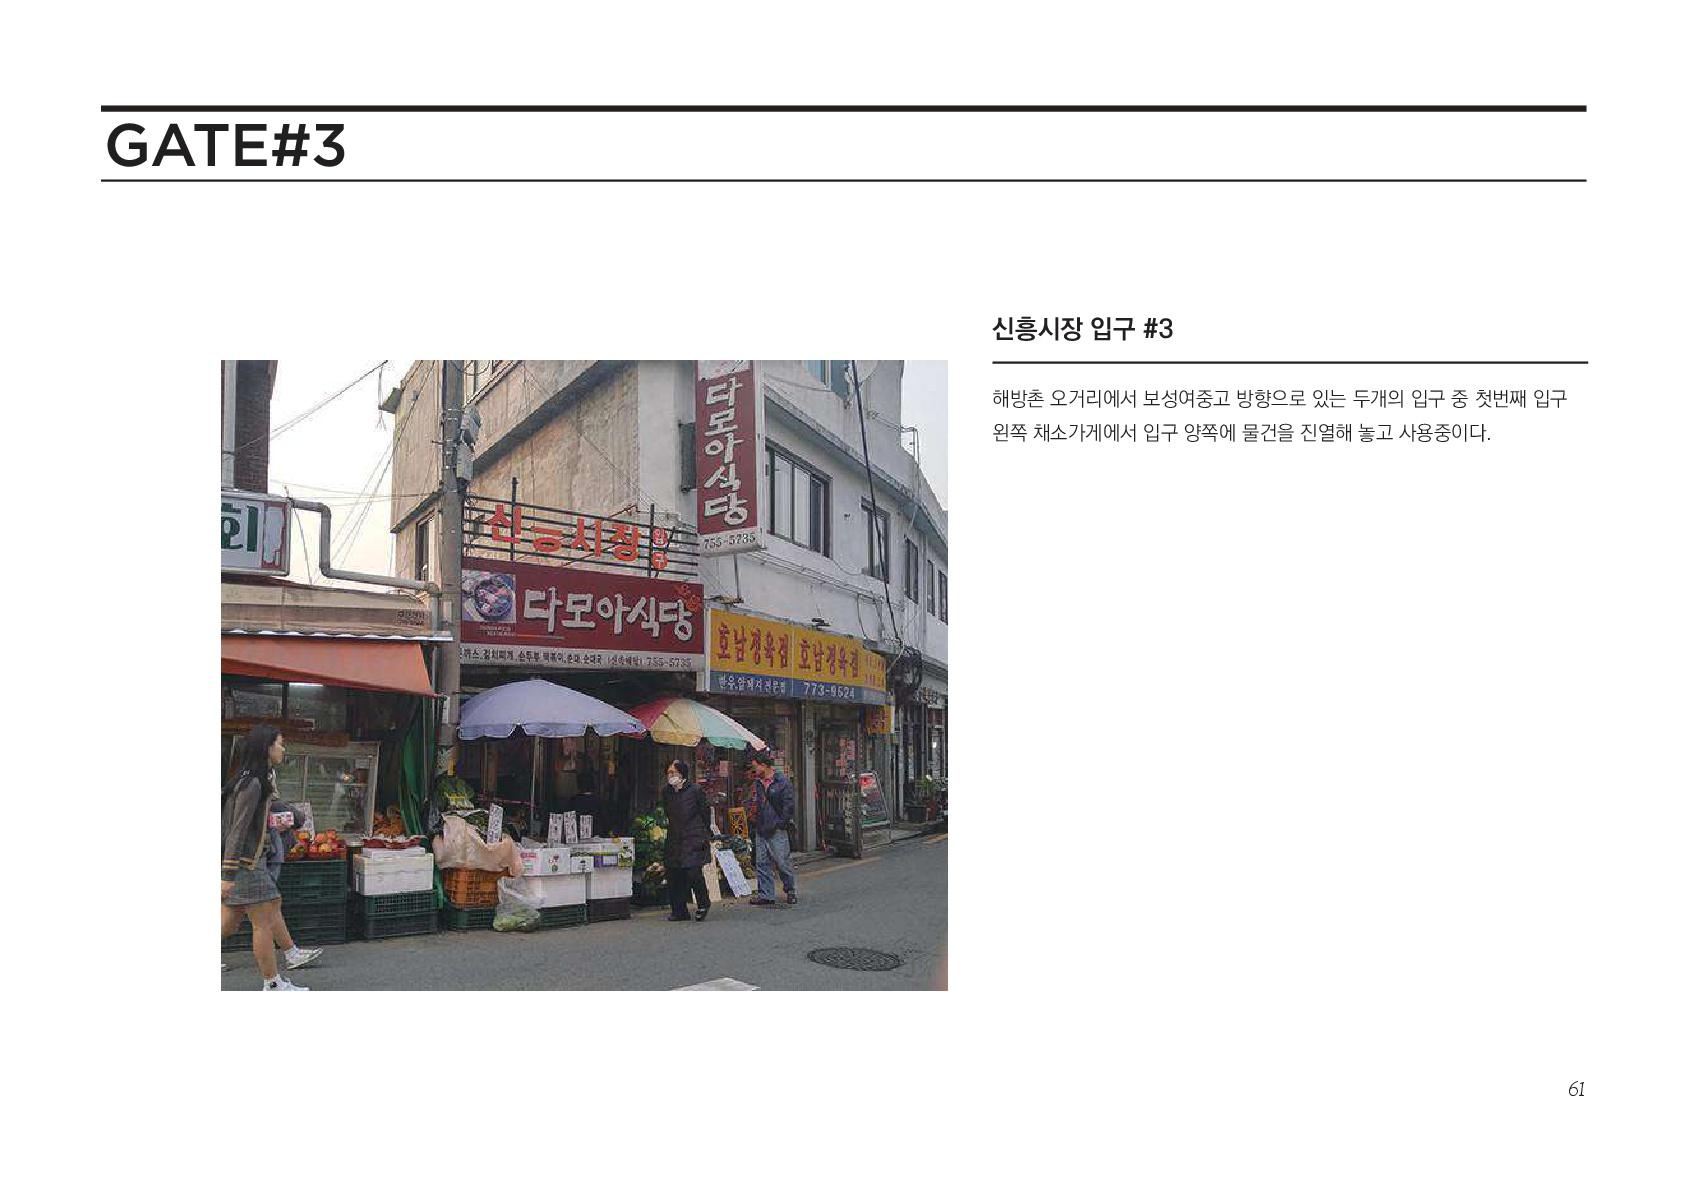 ilovepdf_com-60.jpg